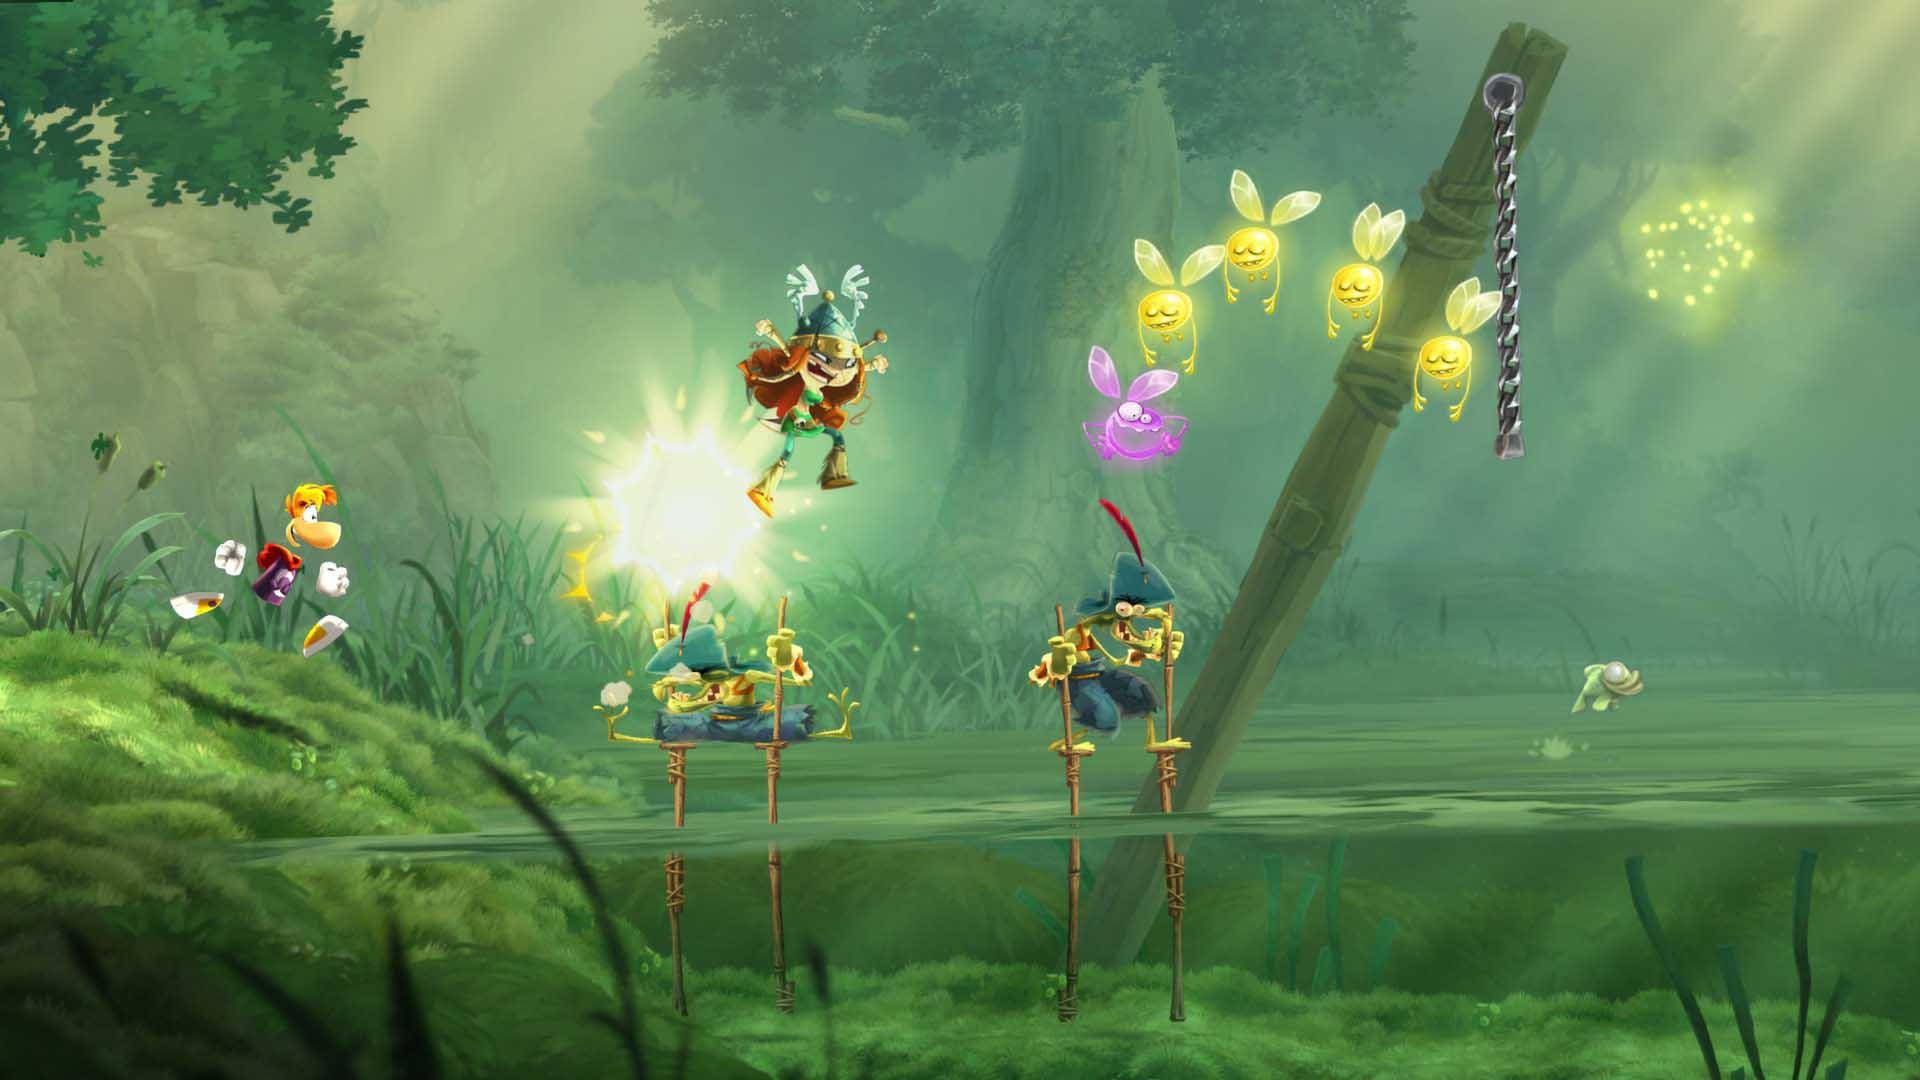 download-Rayman-Legends-hadoan-tv-3